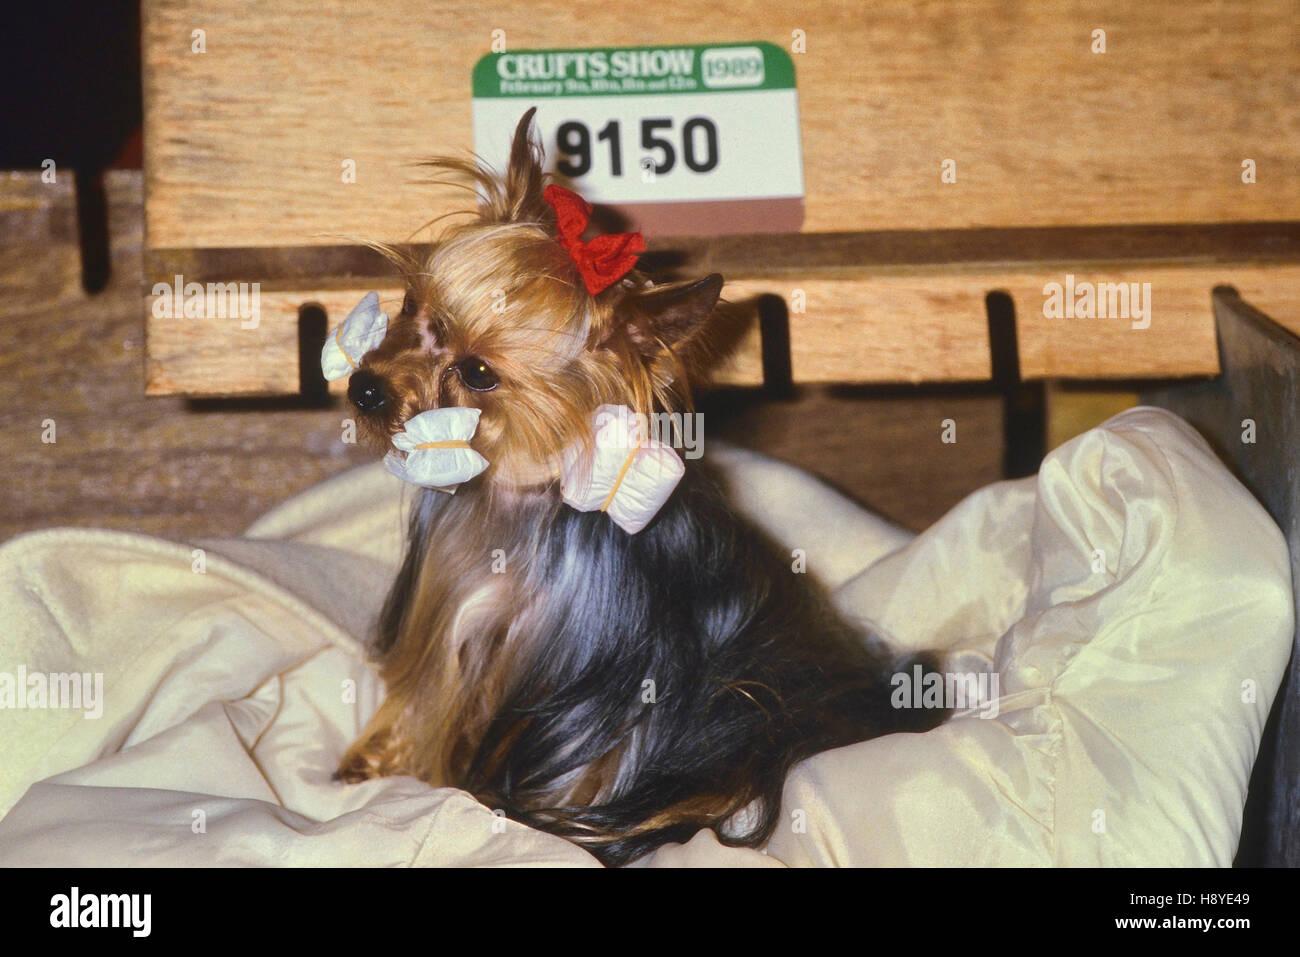 Crufts dog show. Earls Court. London. Circa 1989 - Stock Image